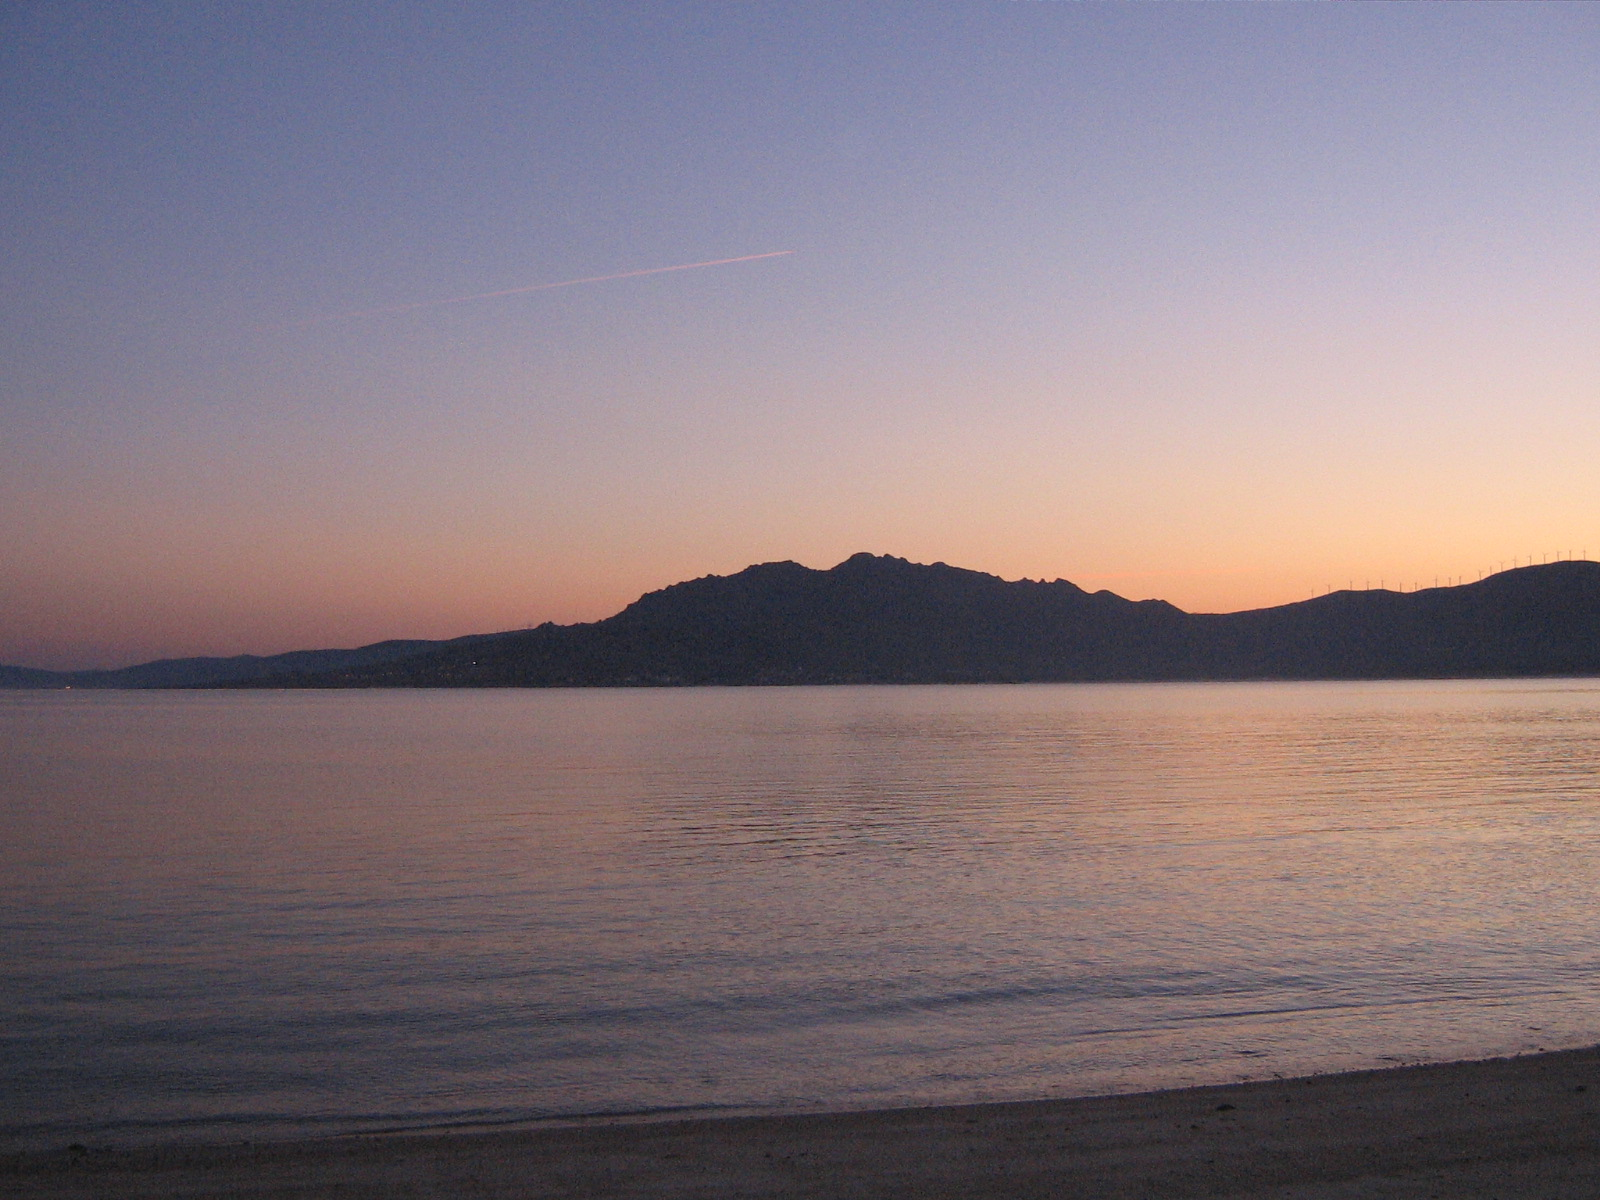 Foto playa Mar de Lira. Alborada desde a praia de Mar de Lira